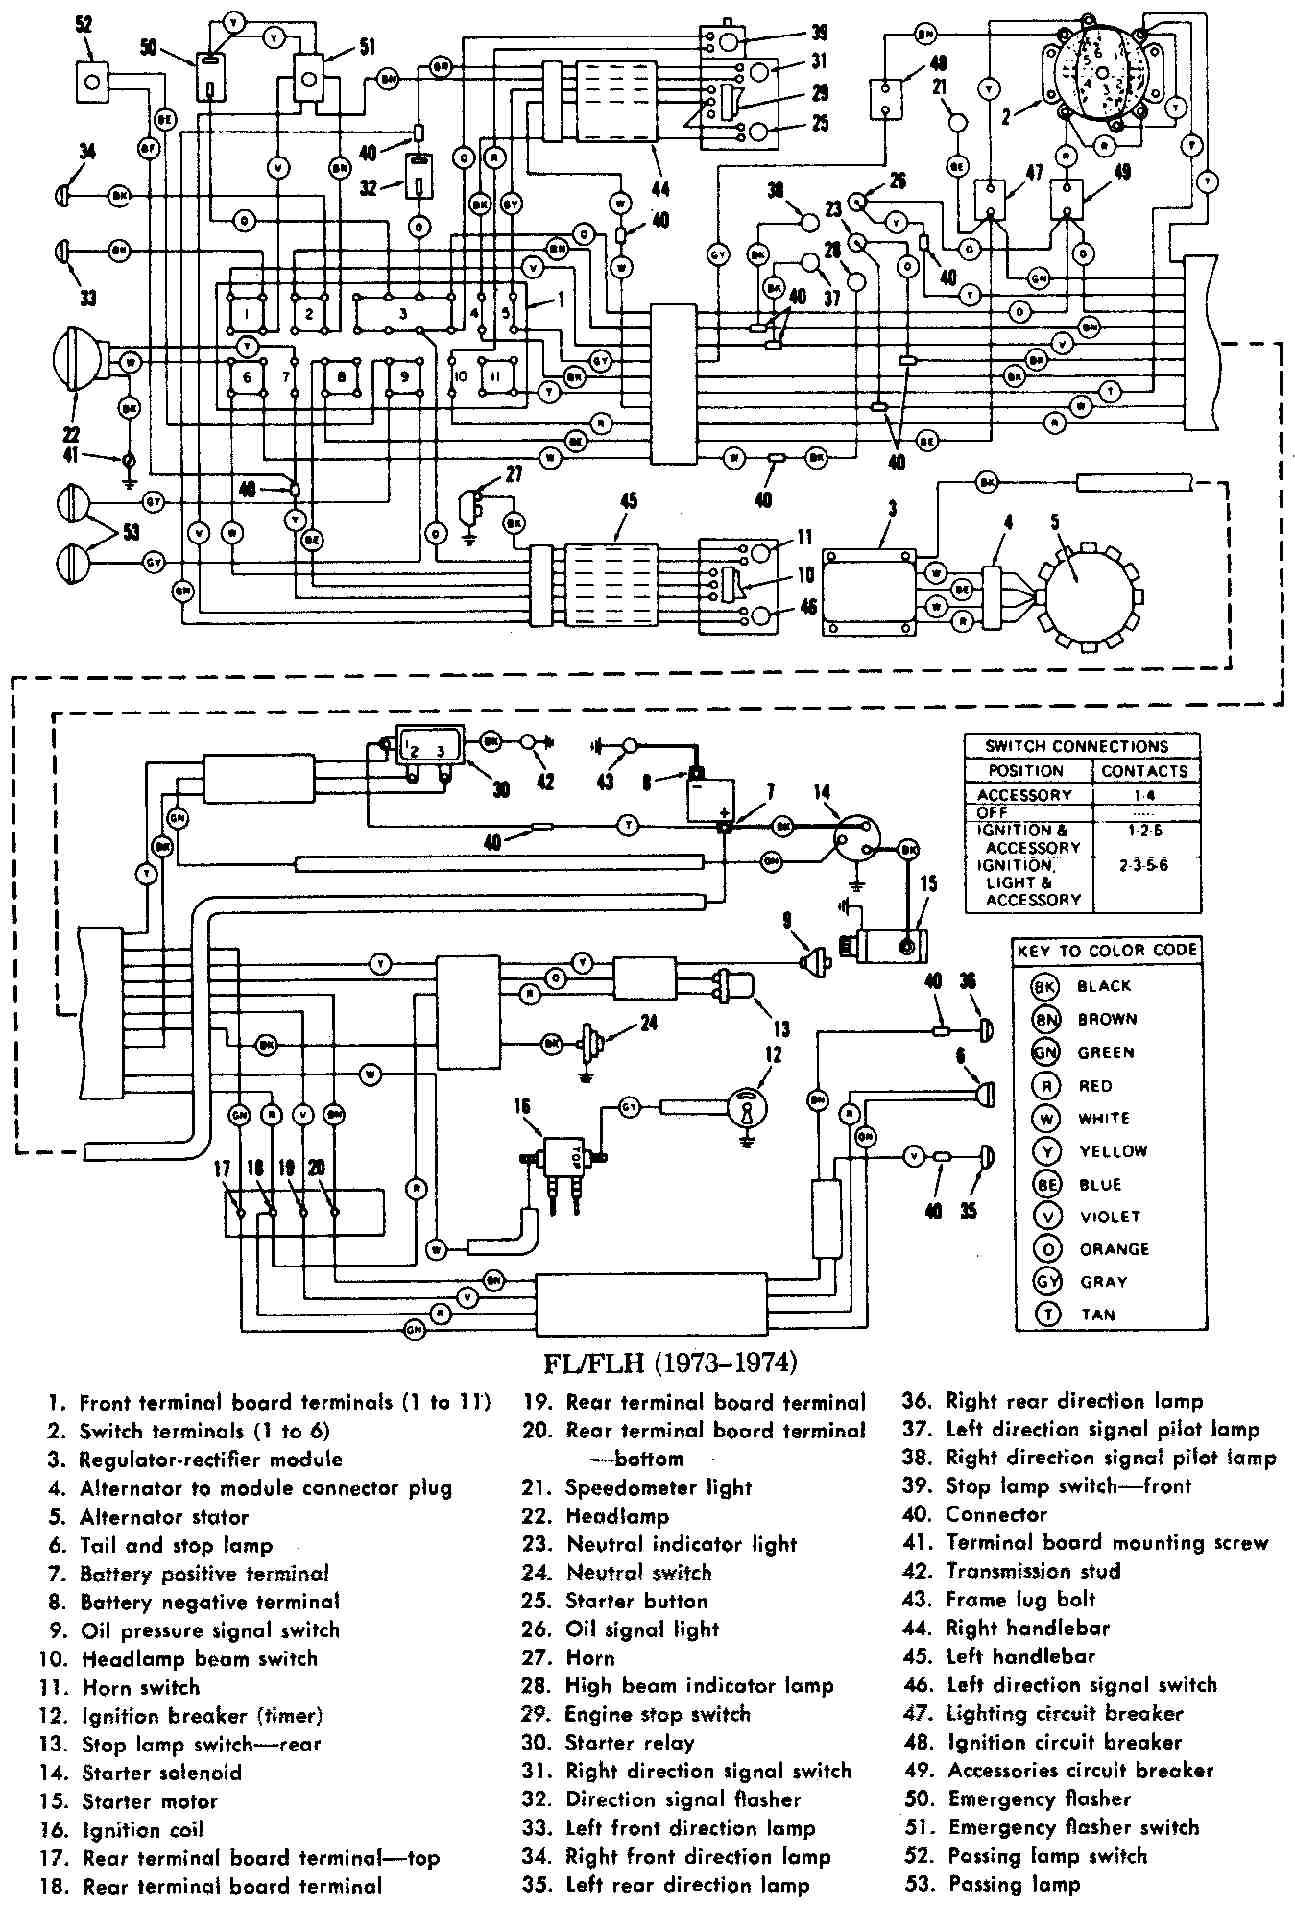 1992 harley davidson 1200 sportster wiring diagram circuit diagram harley night train wiring diagram 1992 harley davidson 1200 sportster wiring diagram [ 1295 x 1907 Pixel ]